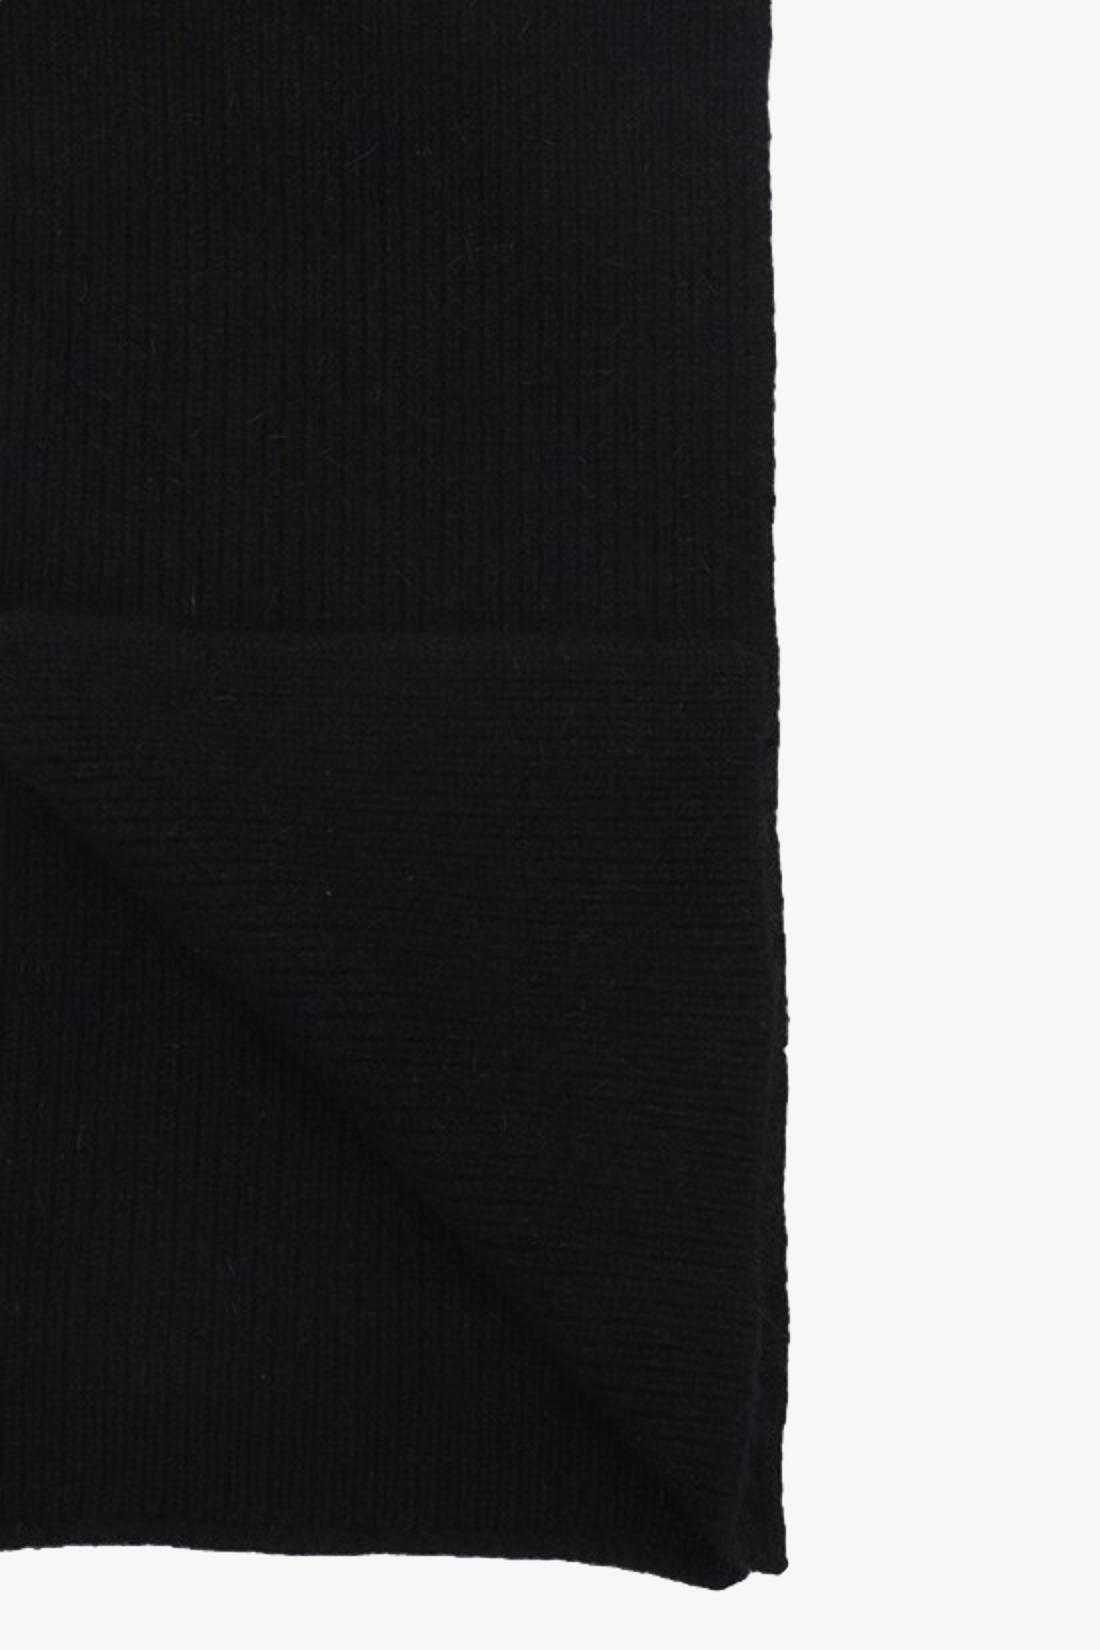 MACKIE / Barra scarf Black